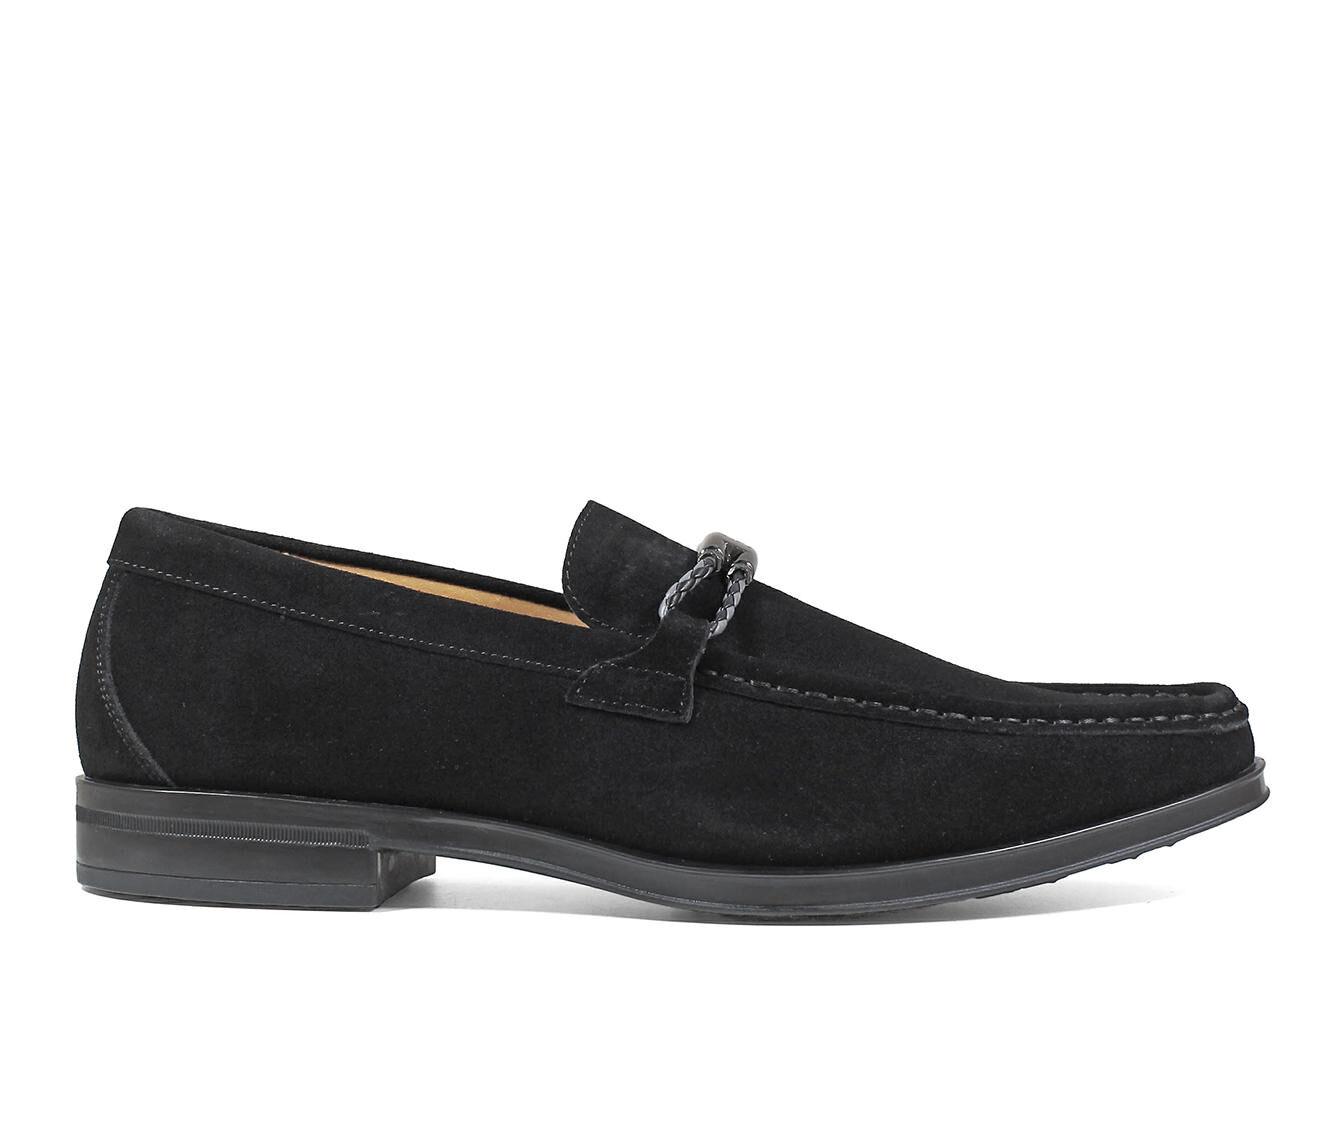 Men's Stacy Adams Neville Suede Moc Slip-On Dress Shoes Black